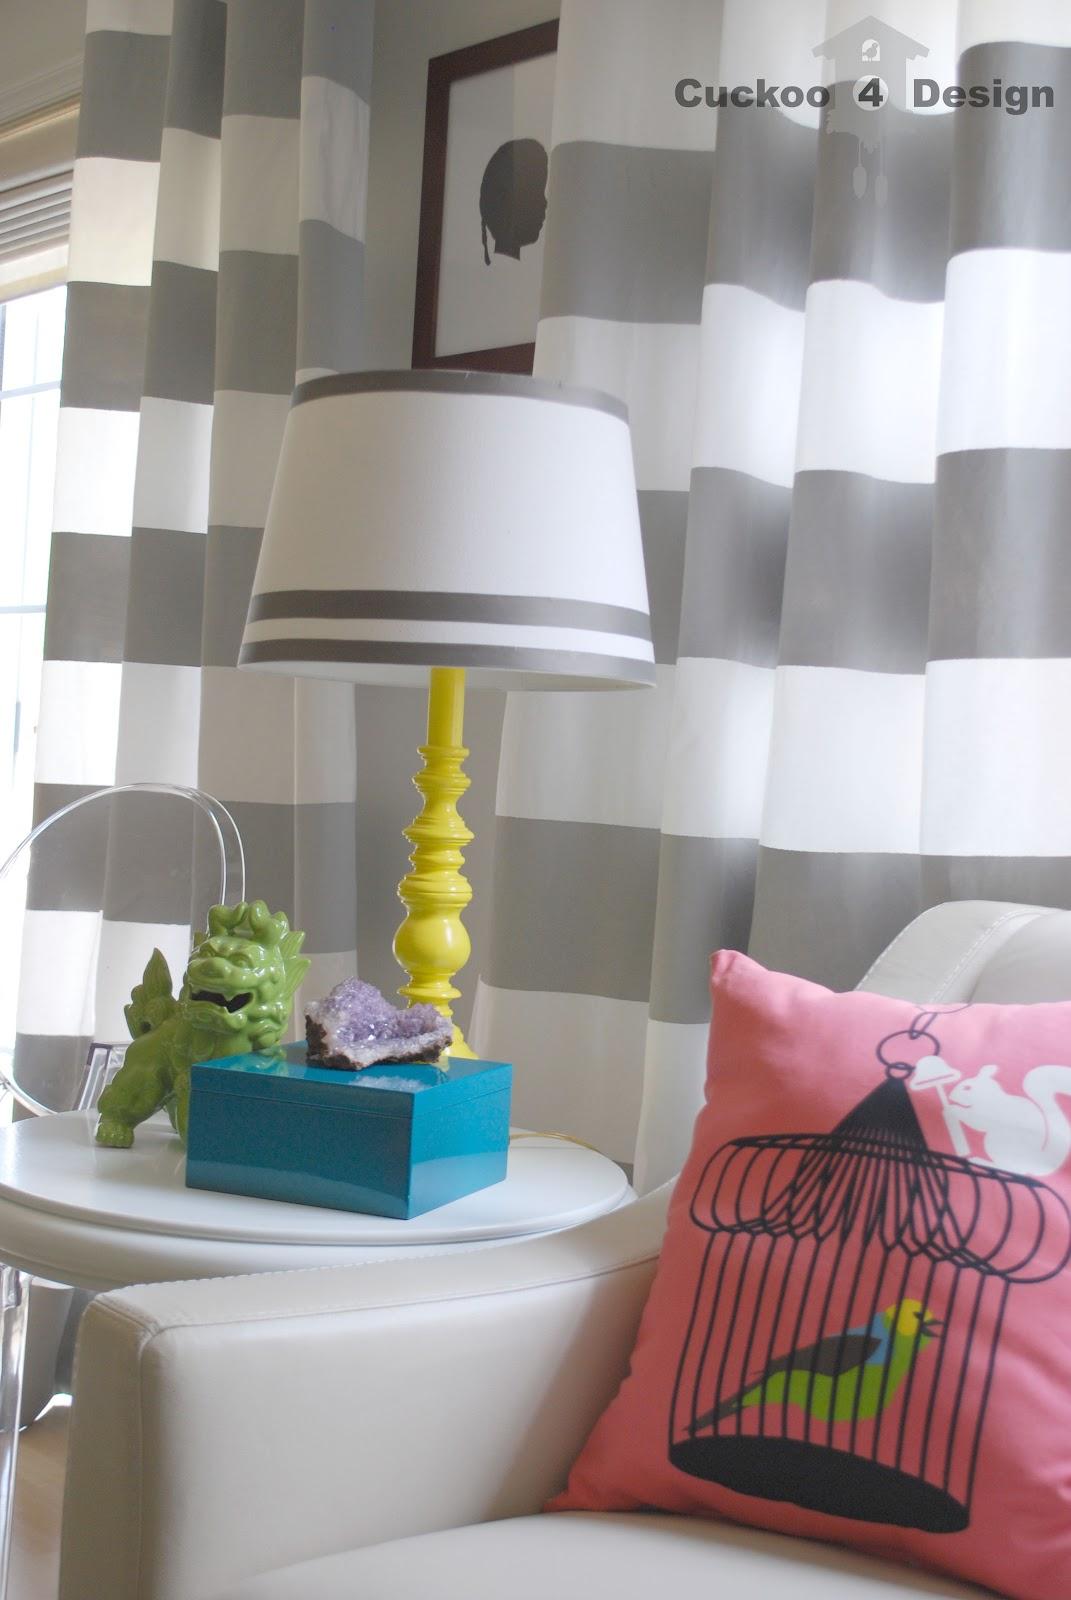 Cuckoo 4 Design: DIY lighting